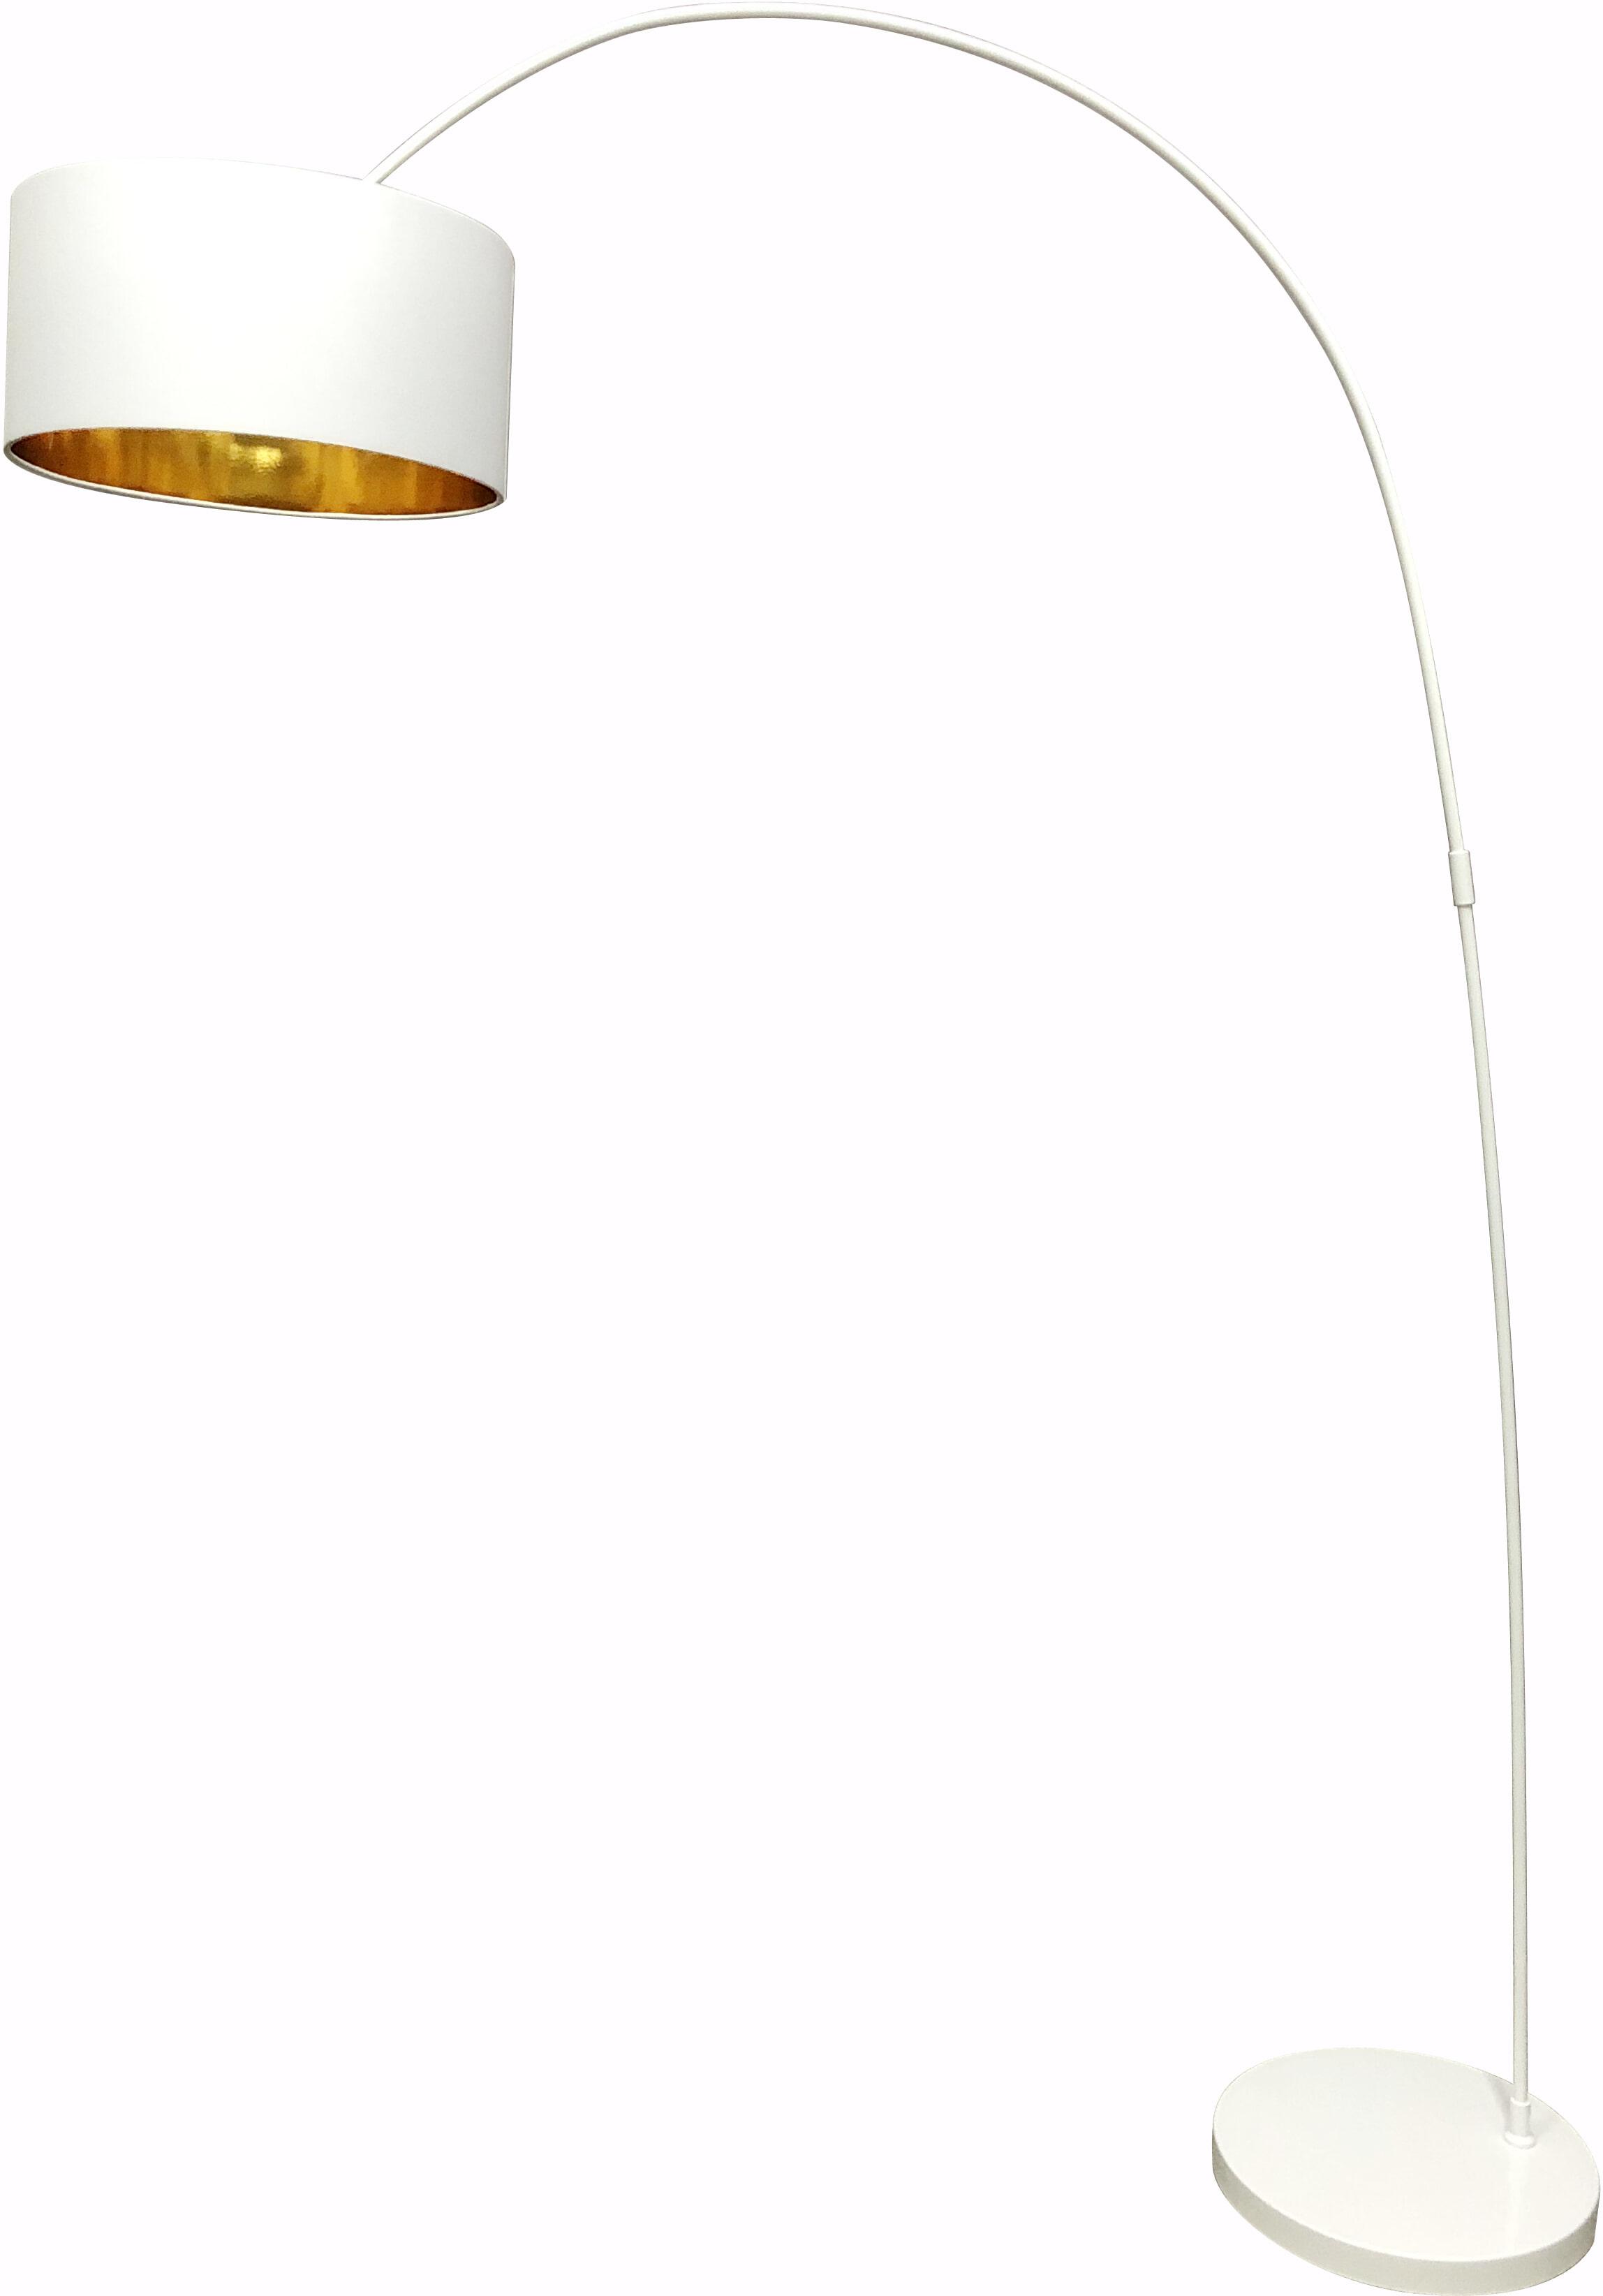 Artistiq Vloerlamp 'Gimmie', kleur Wit